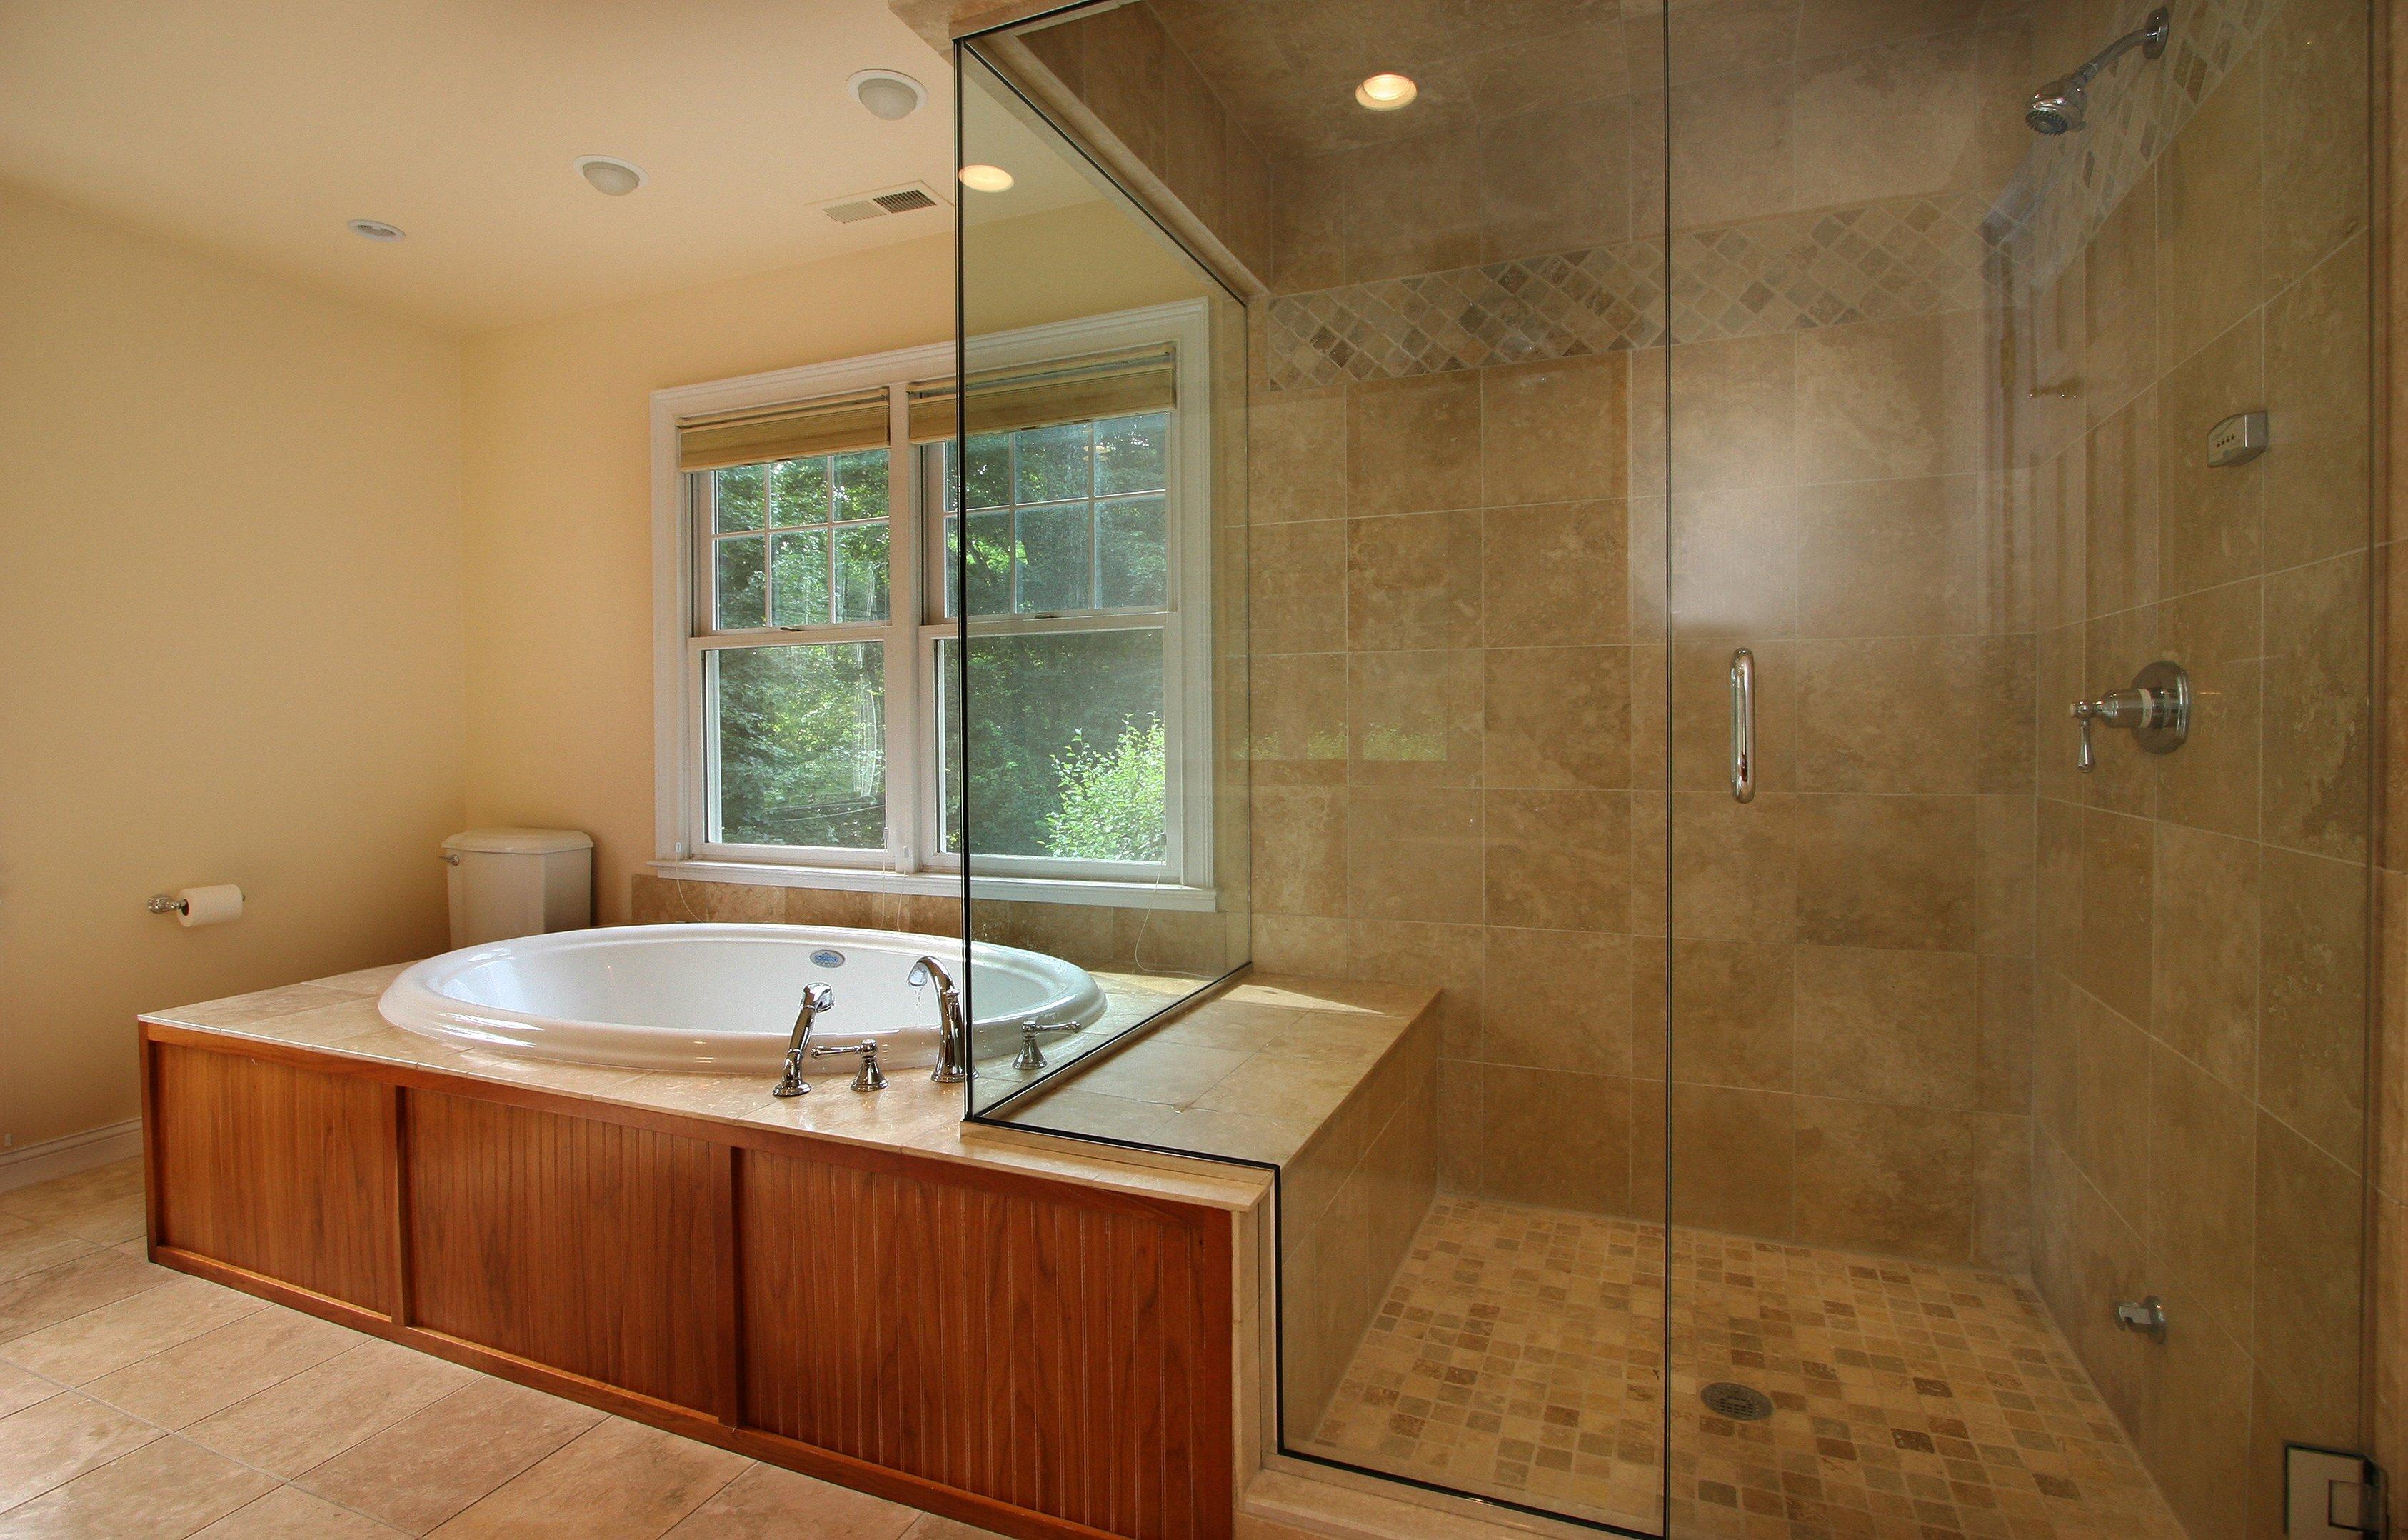 General Contractor, Bathroom Renovation By SIP Building Solutions General  Contractors   Westport, Fairfield,